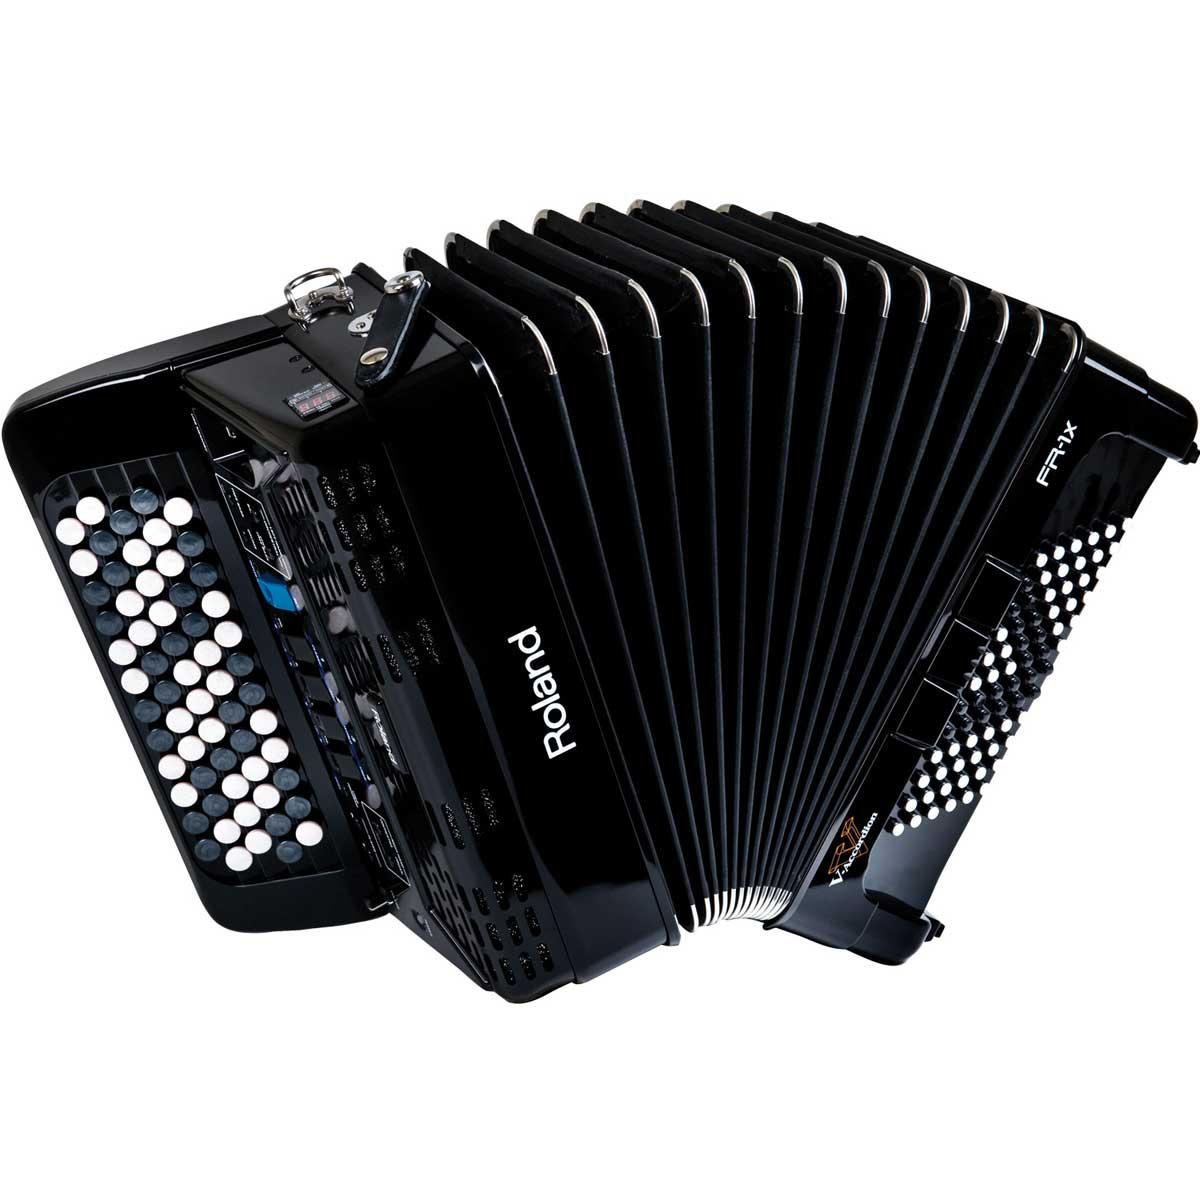 Roland ローランド / V-Accordion FR-1XB BK ブラック Vアコーディオン ボタン鍵盤タイプ【お取り寄せ商品】【YRK】